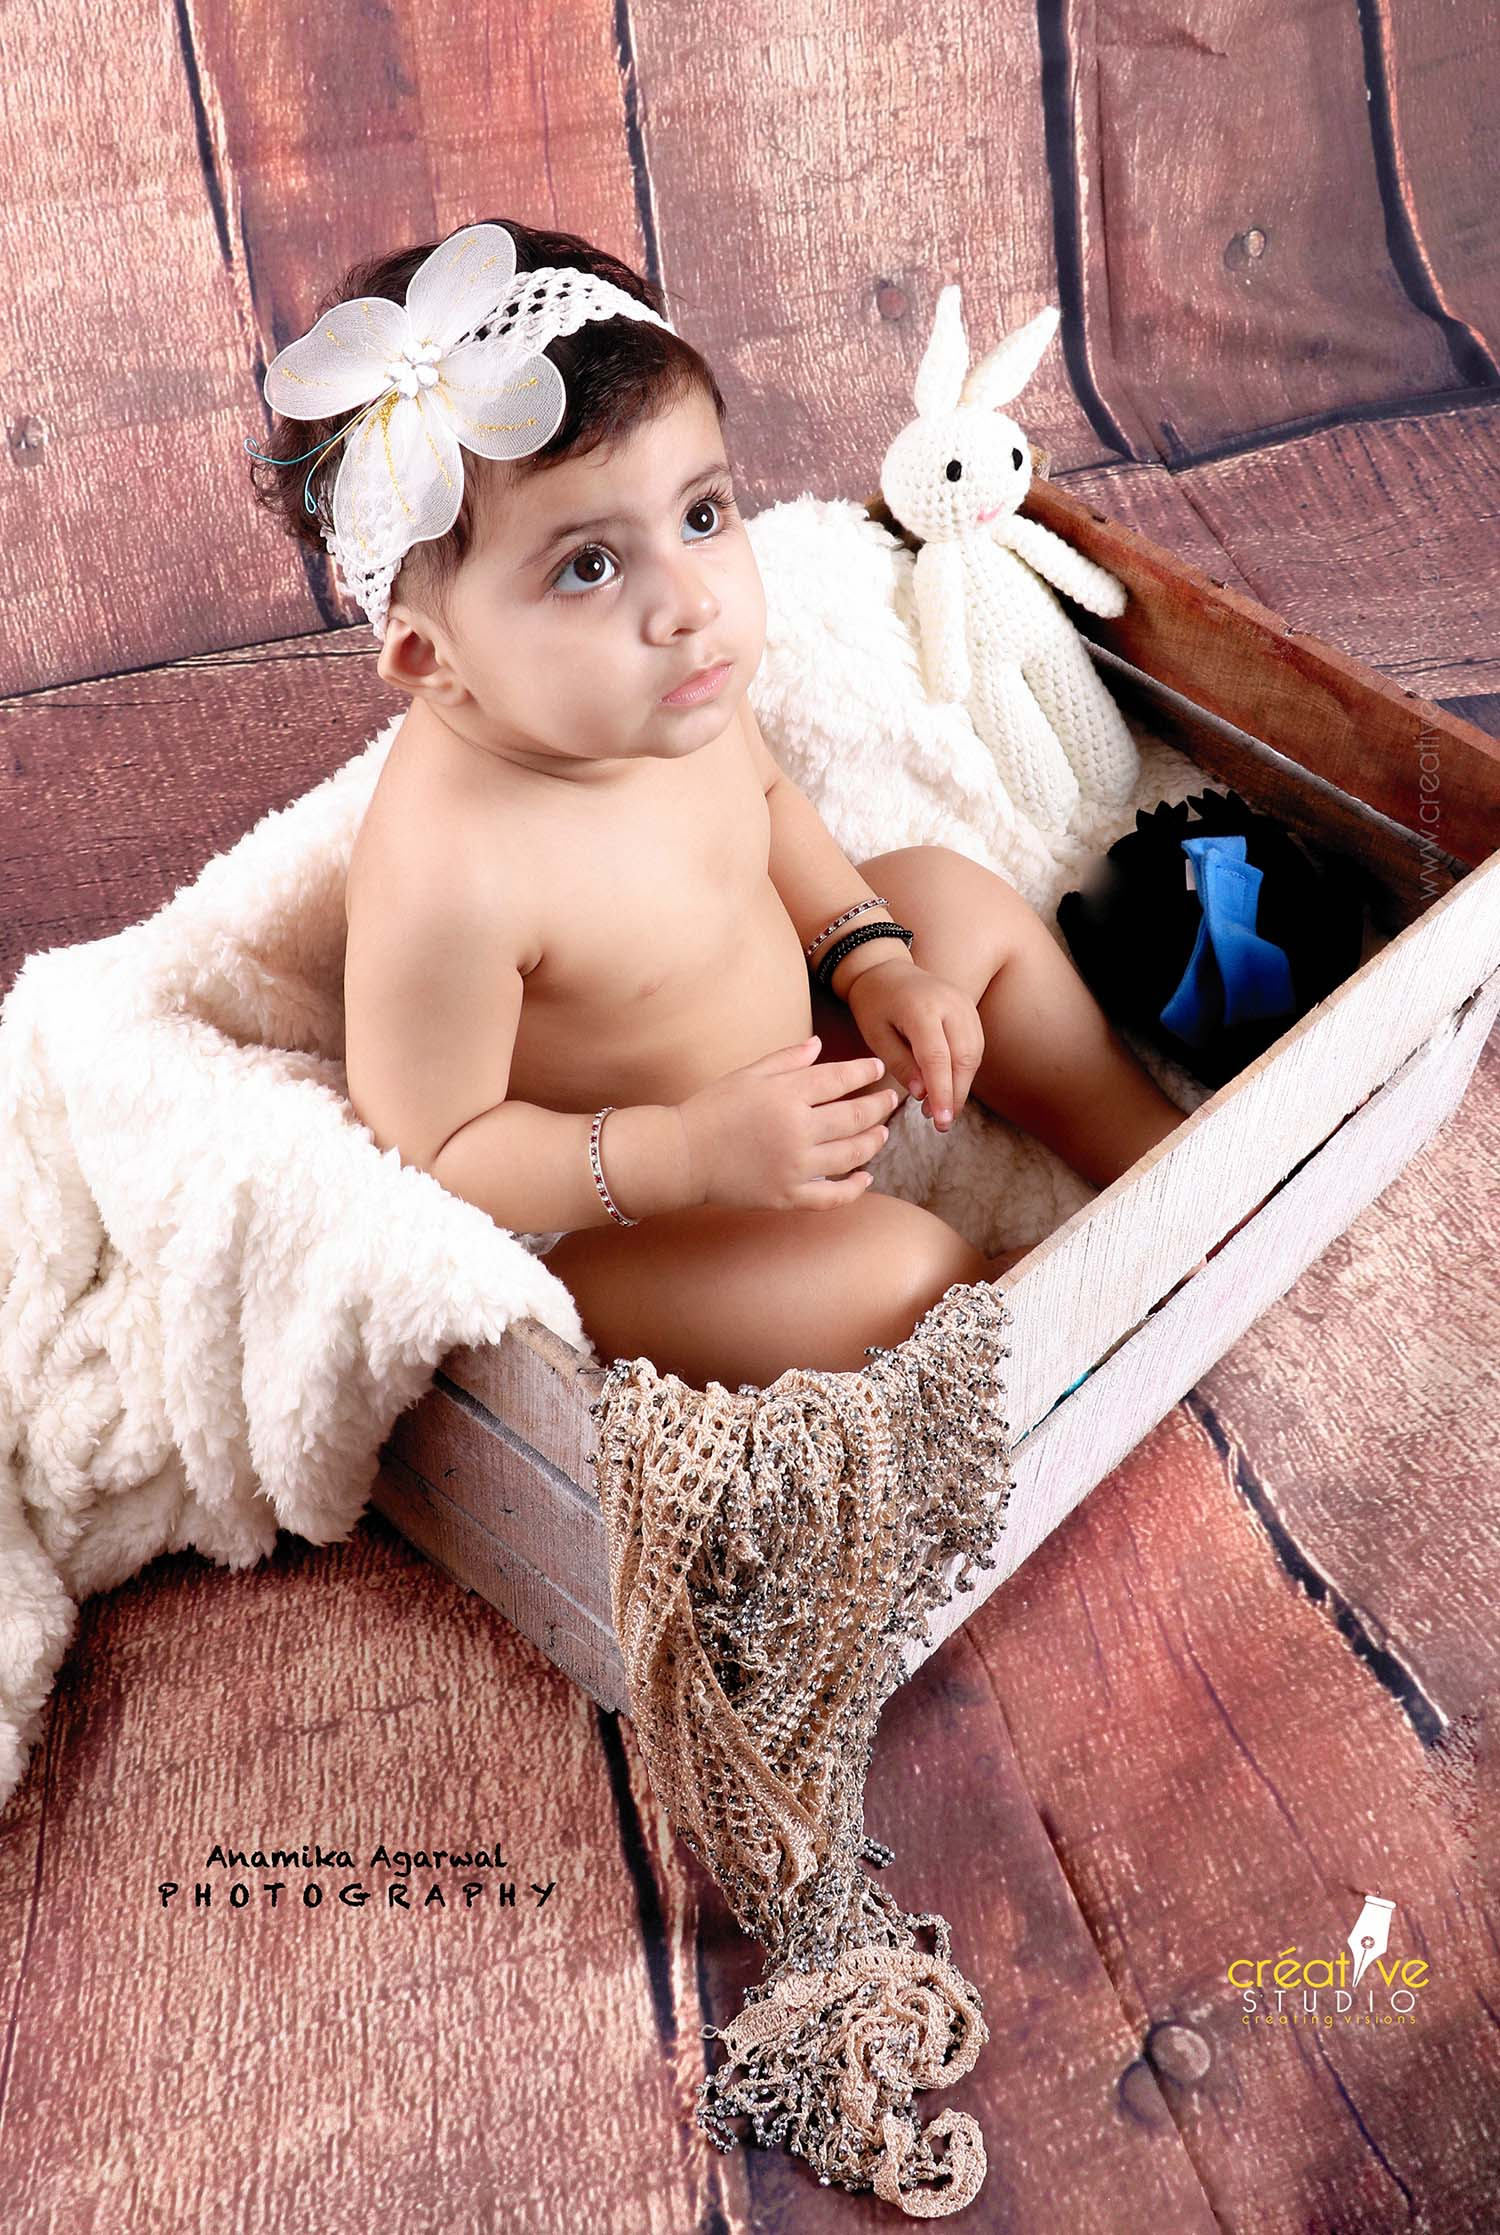 bABY6 - Baby & Kids Photography Portfolio